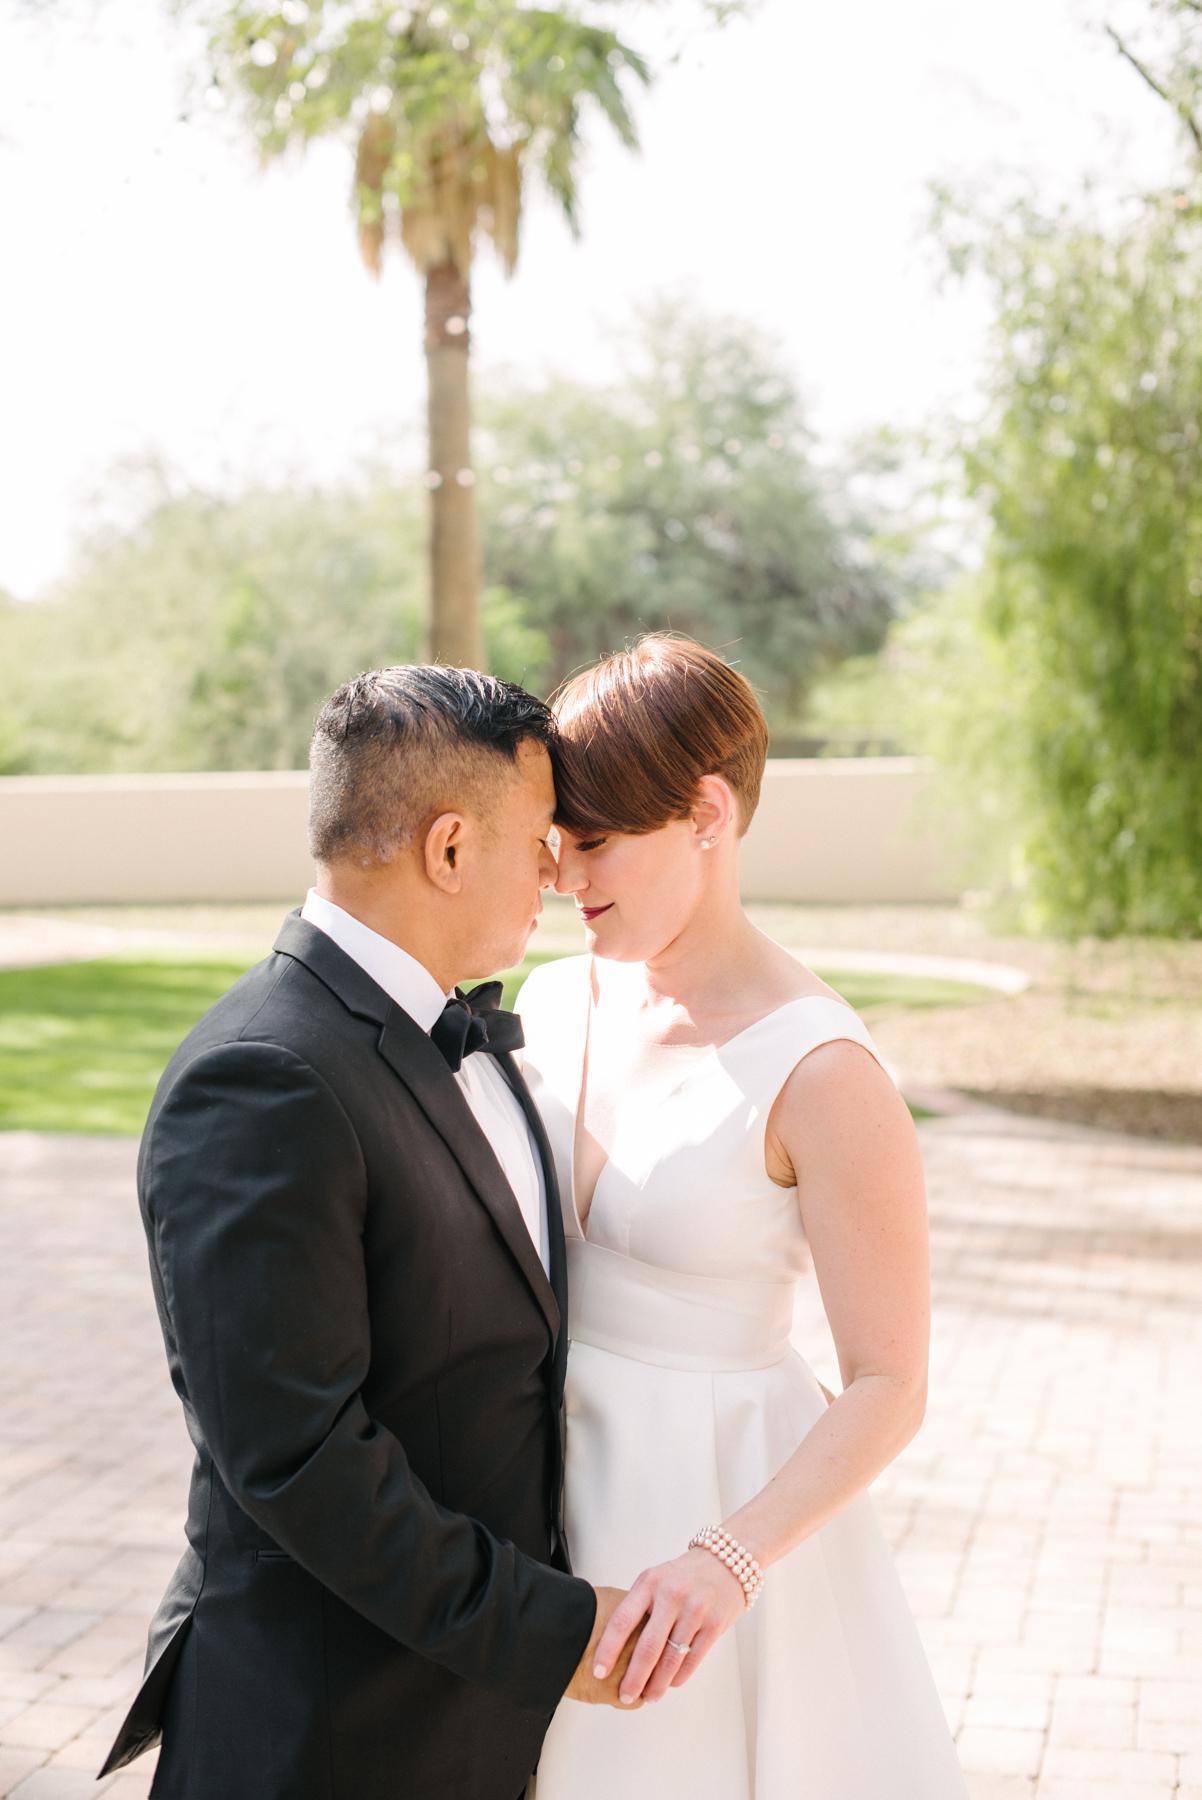 Secret Garden Event Center Wedding - Meredith Amadee Photography-39.jpg